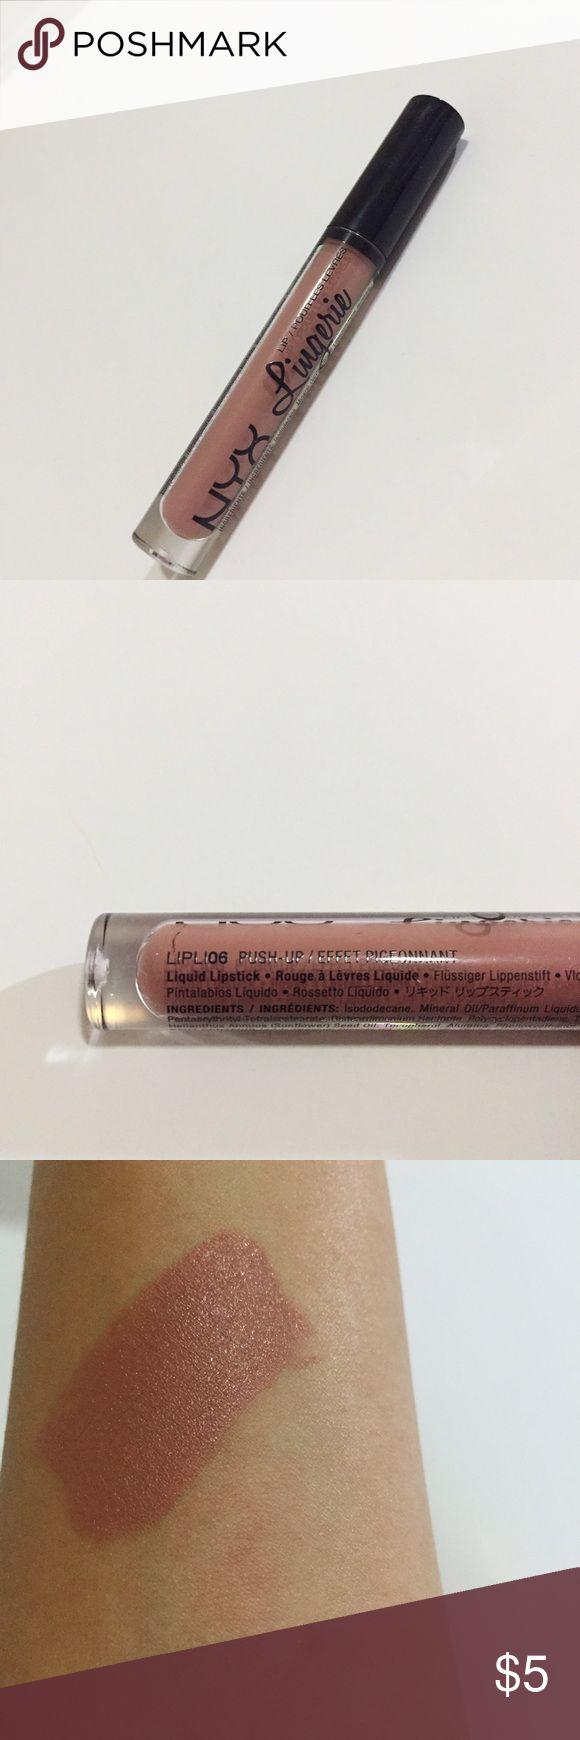 NYX Lingerie Push Up NYX Lingerie in Push Up | NEVER USED NYX Makeup Lipstick